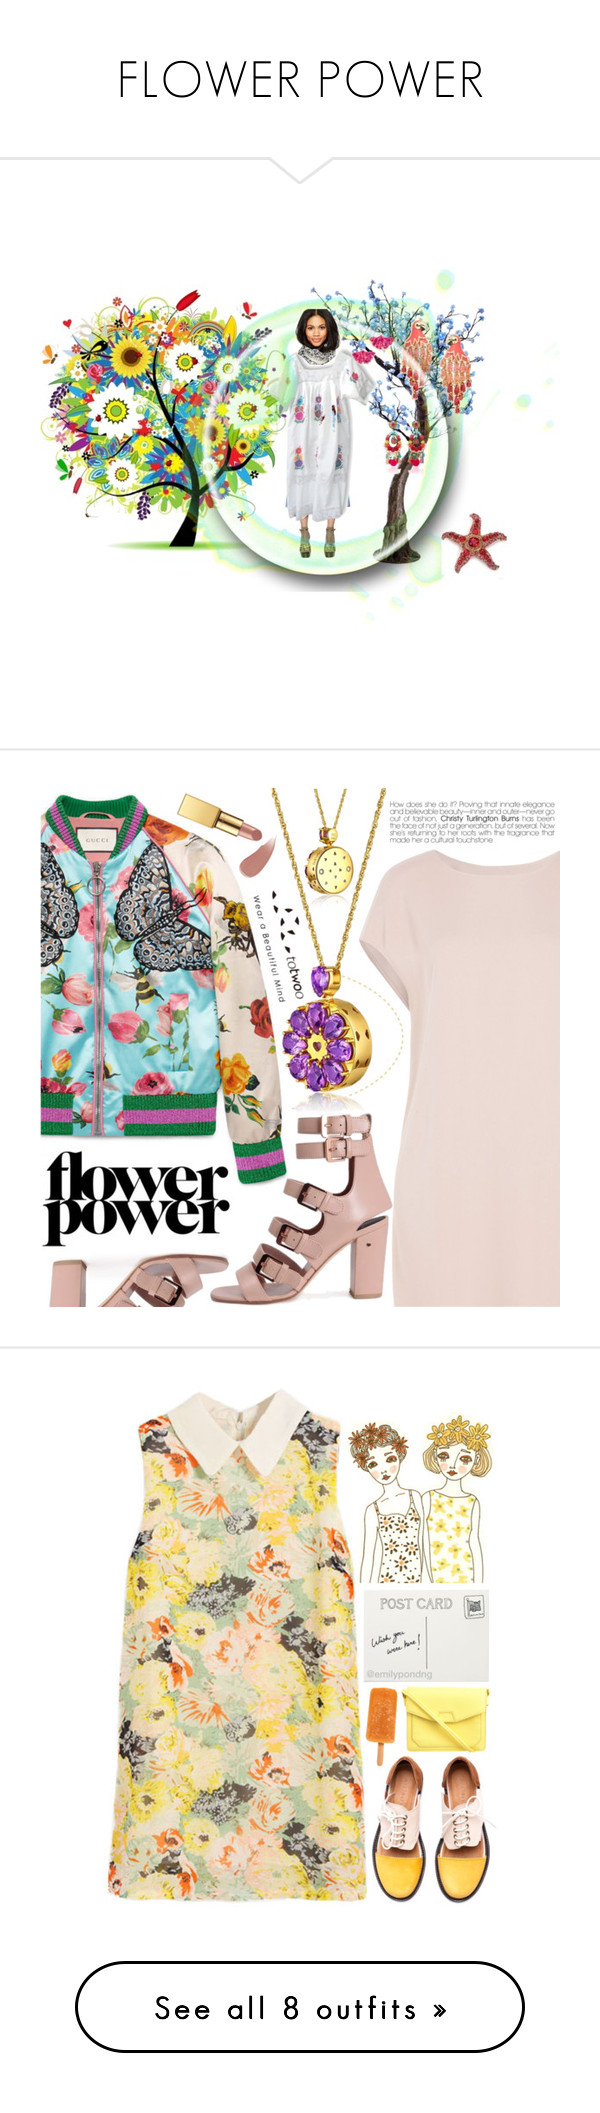 """FLOWER POWER"" by zazaofcanada ❤ liked on Polyvore featuring vintage, boho, Bohemian, mexicandresses, Antonio Marras, Kenneth Jay Lane, Kate Spade, Ranjana Khan, Yumi and Summer"